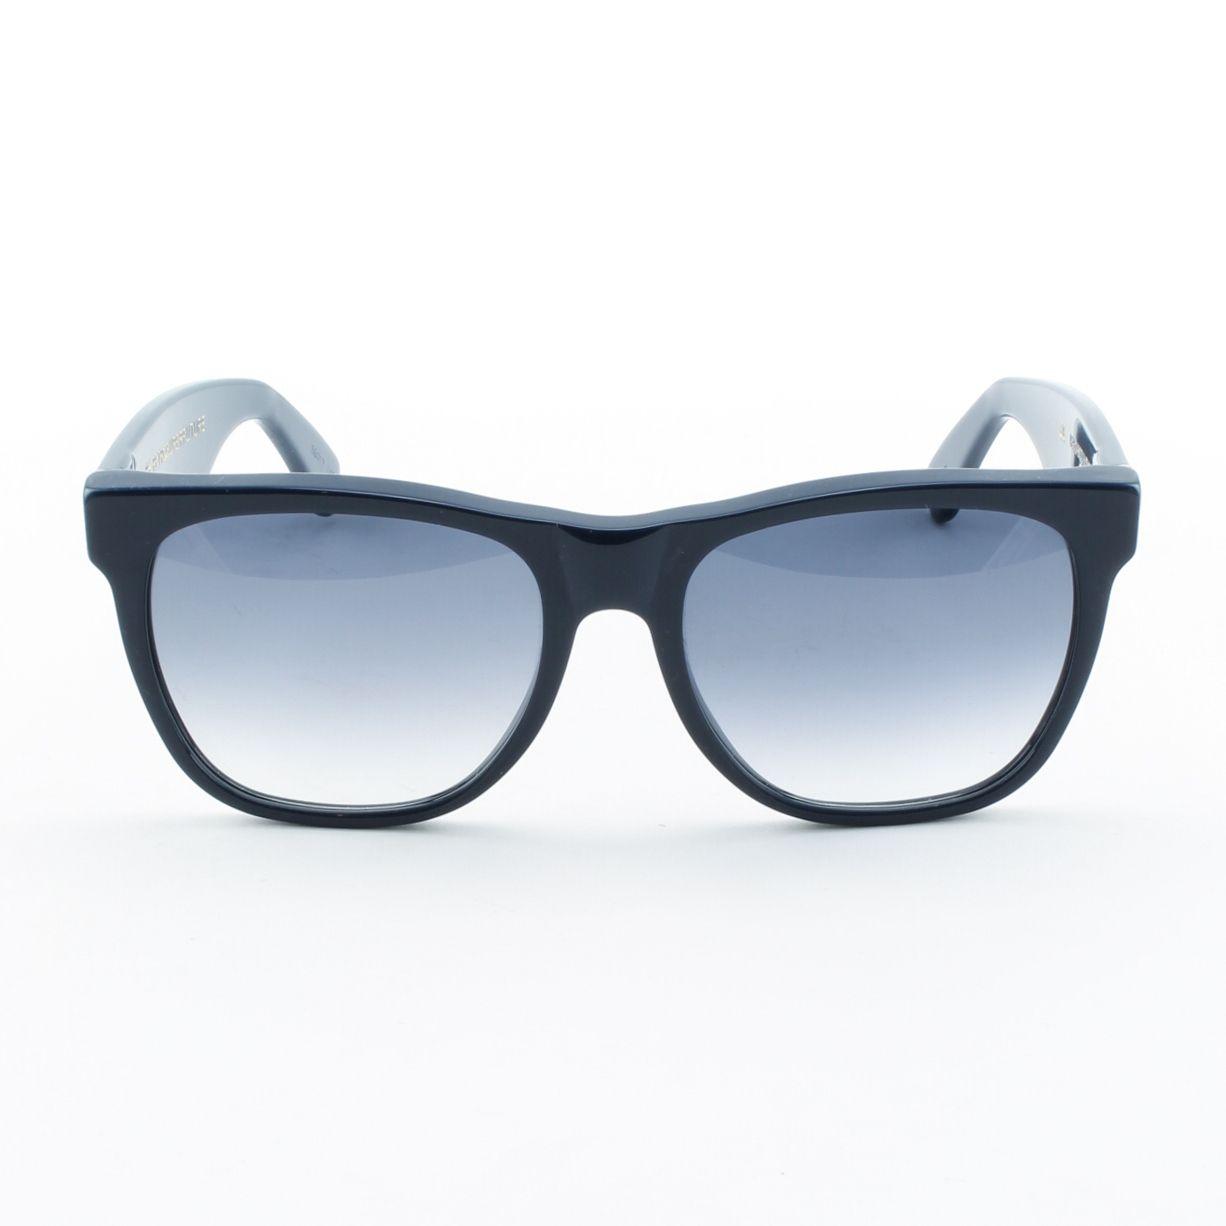 Super Classic 763 Wayfarer Sunglasses by RETROSUPERFUTURE